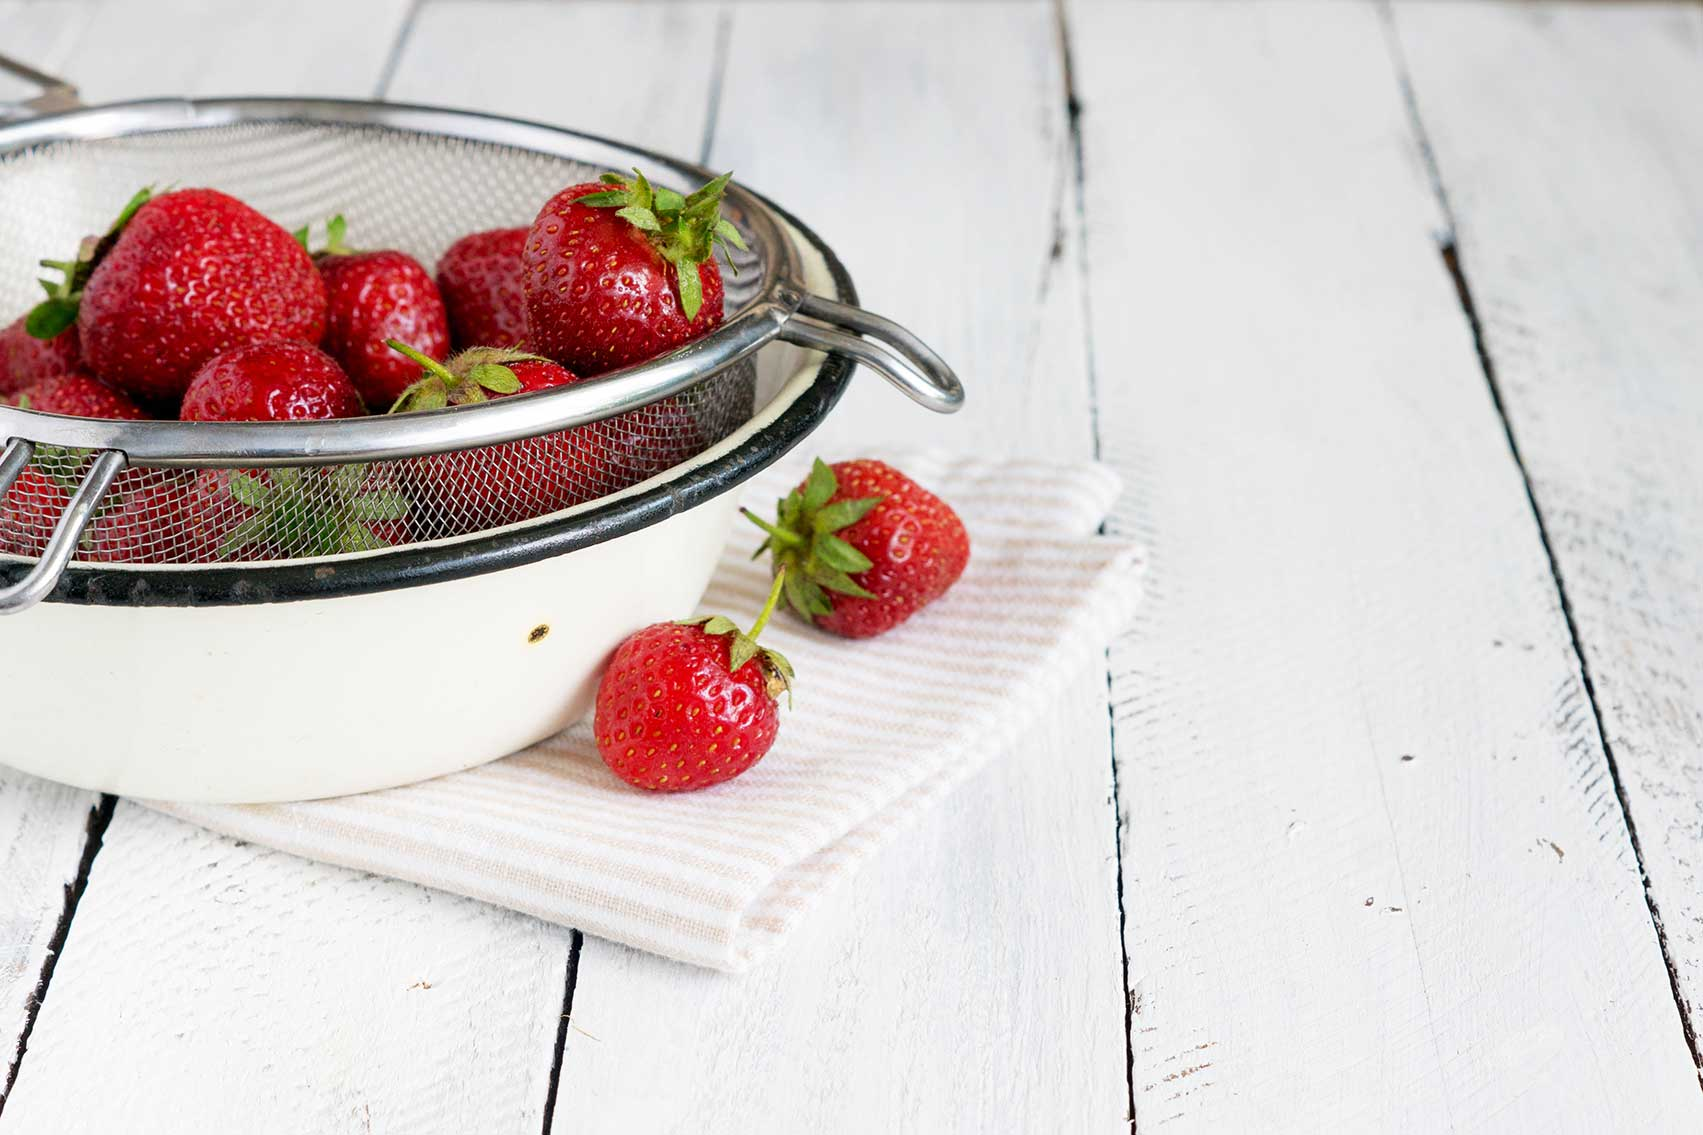 6 leckere rezepte mit erdbeeren selber machen. Black Bedroom Furniture Sets. Home Design Ideas